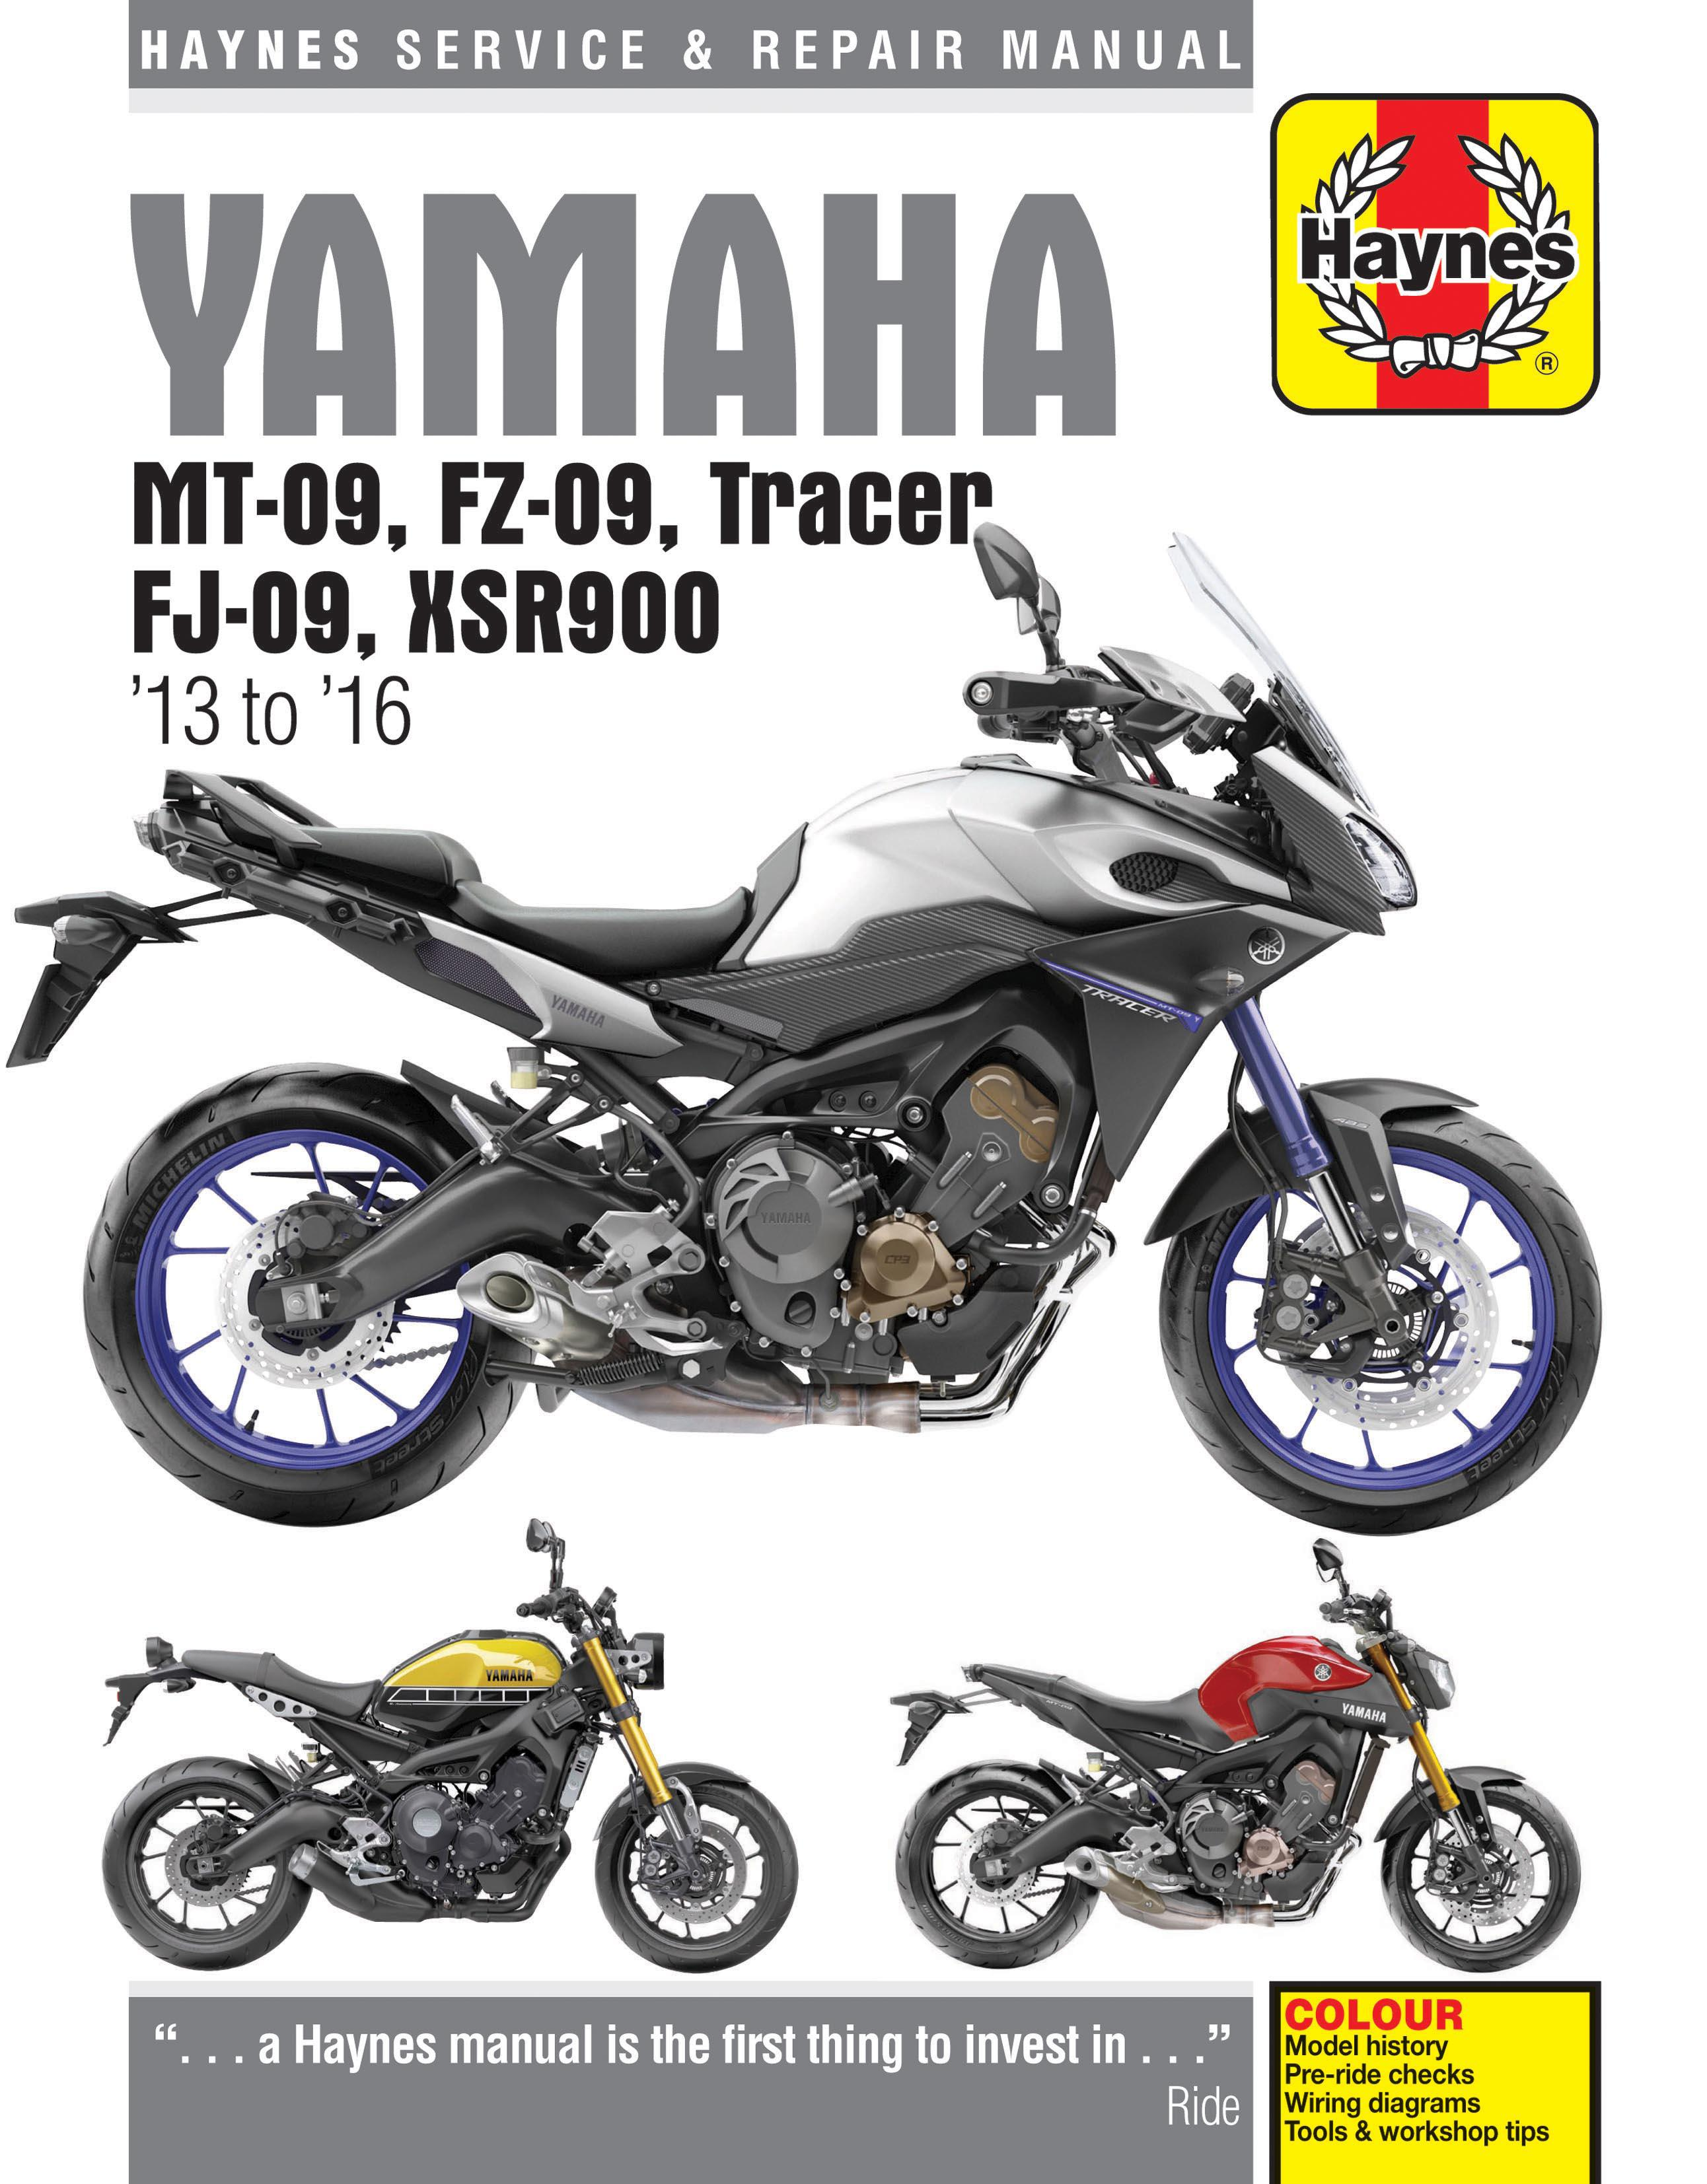 haynes yamaha mt 09 13 16 manual rh halfords com Yamaha FZ16 Philippines Yamaha FZ16 Modified